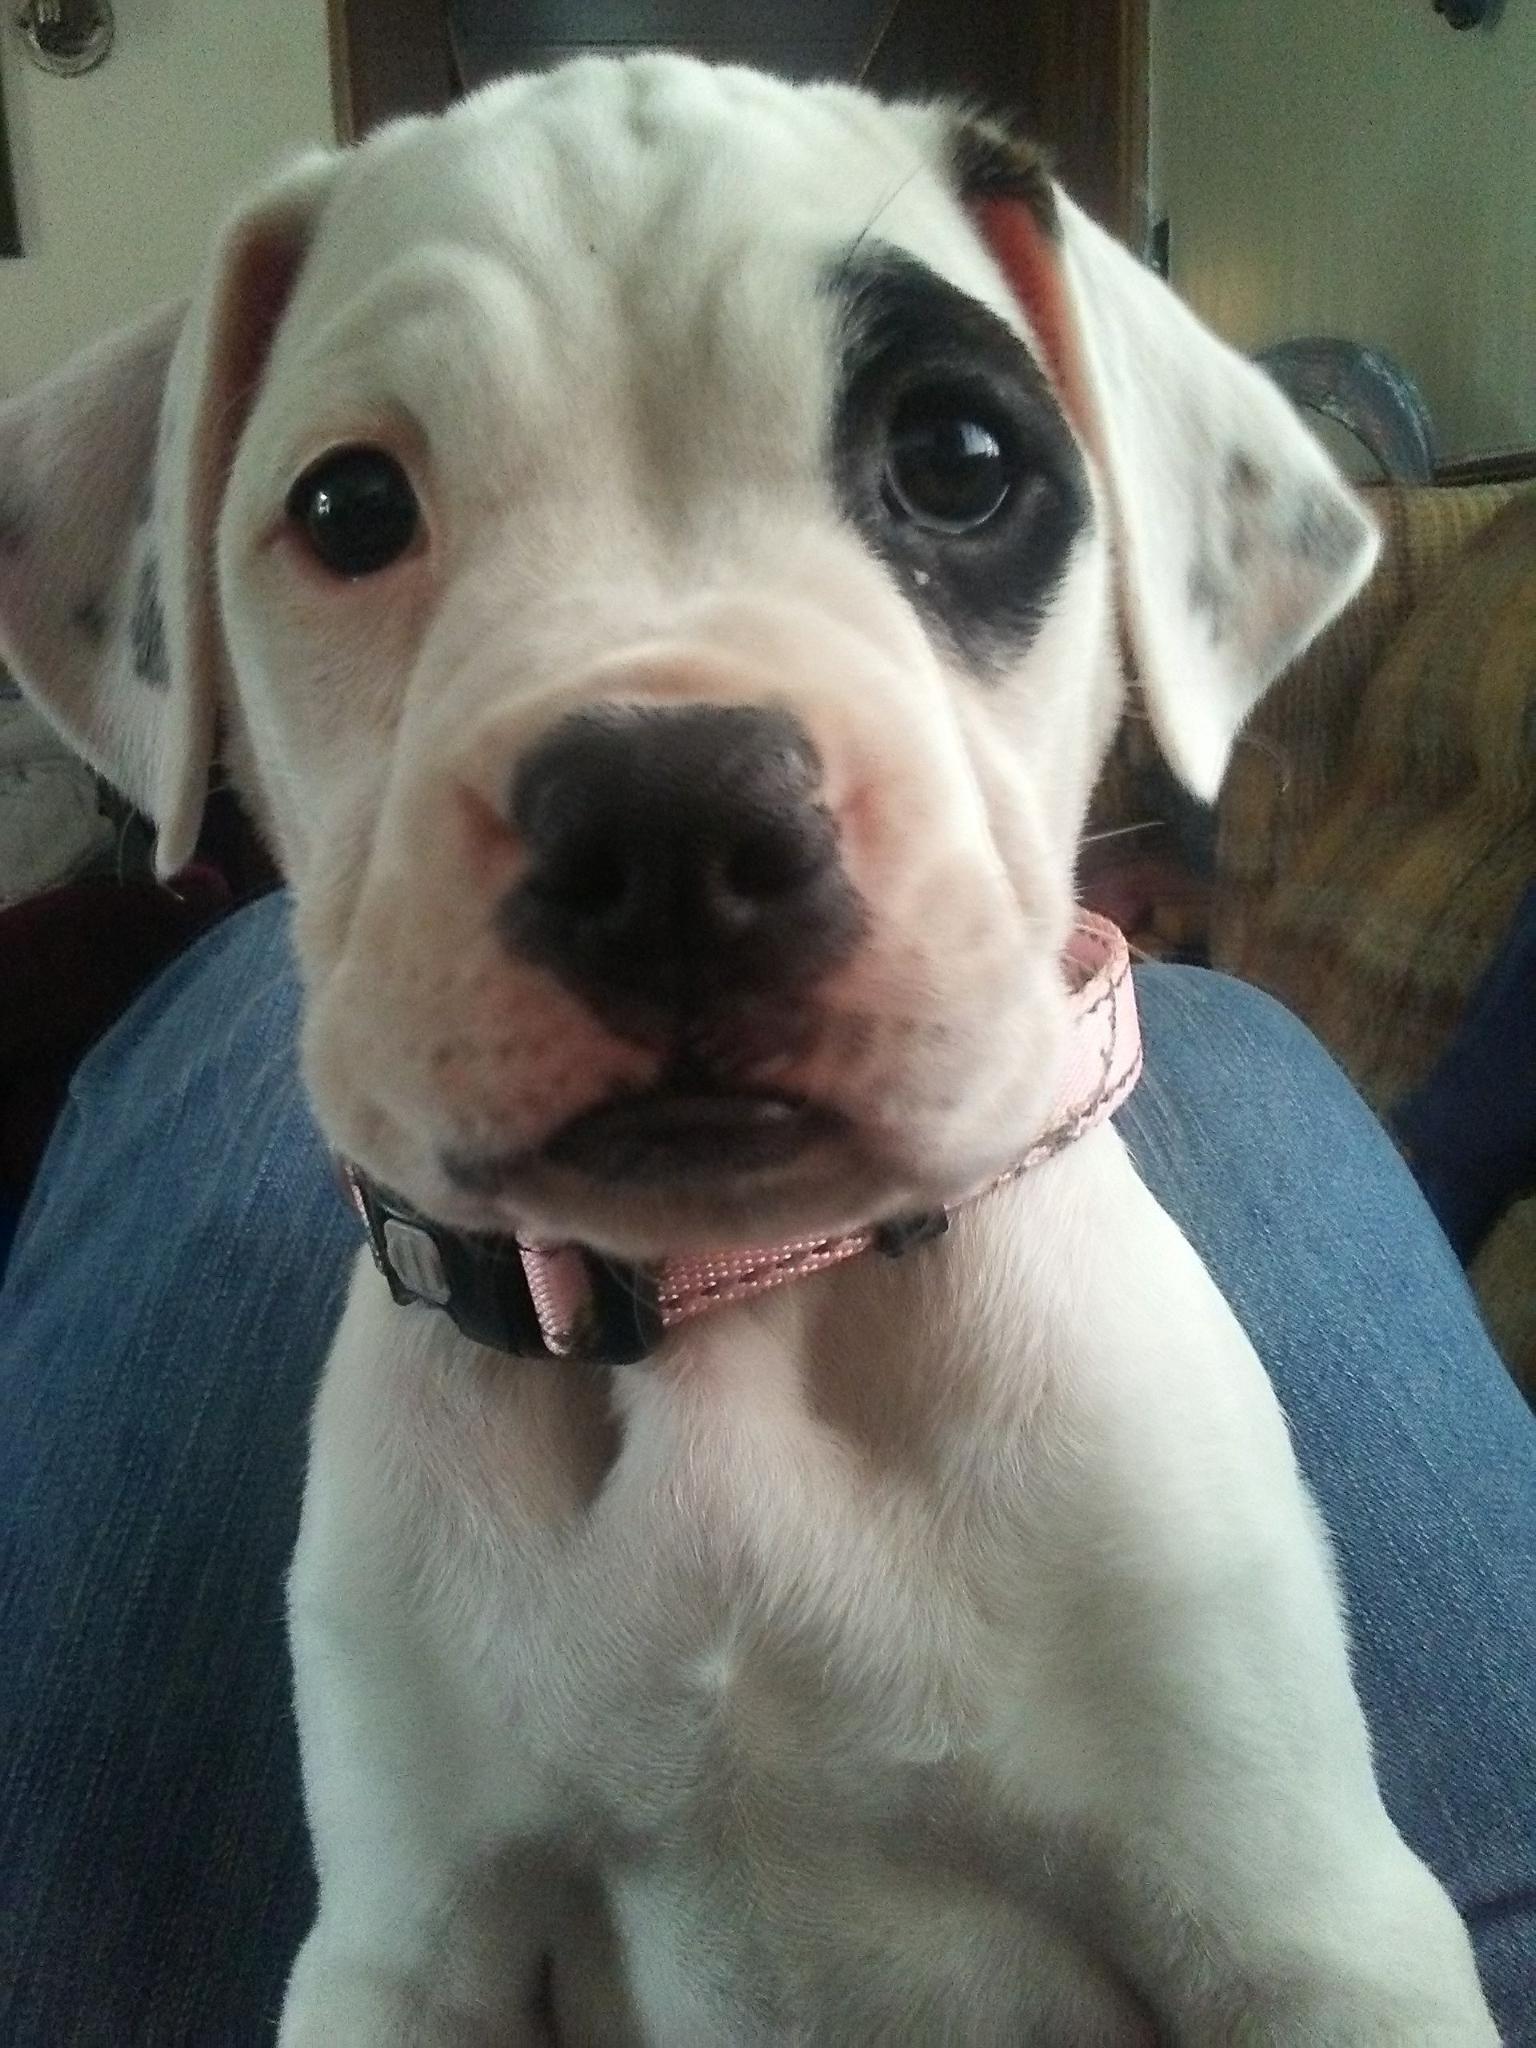 Reddit meet Sierra my new puppy https://ift tt/2I5nMEG | All